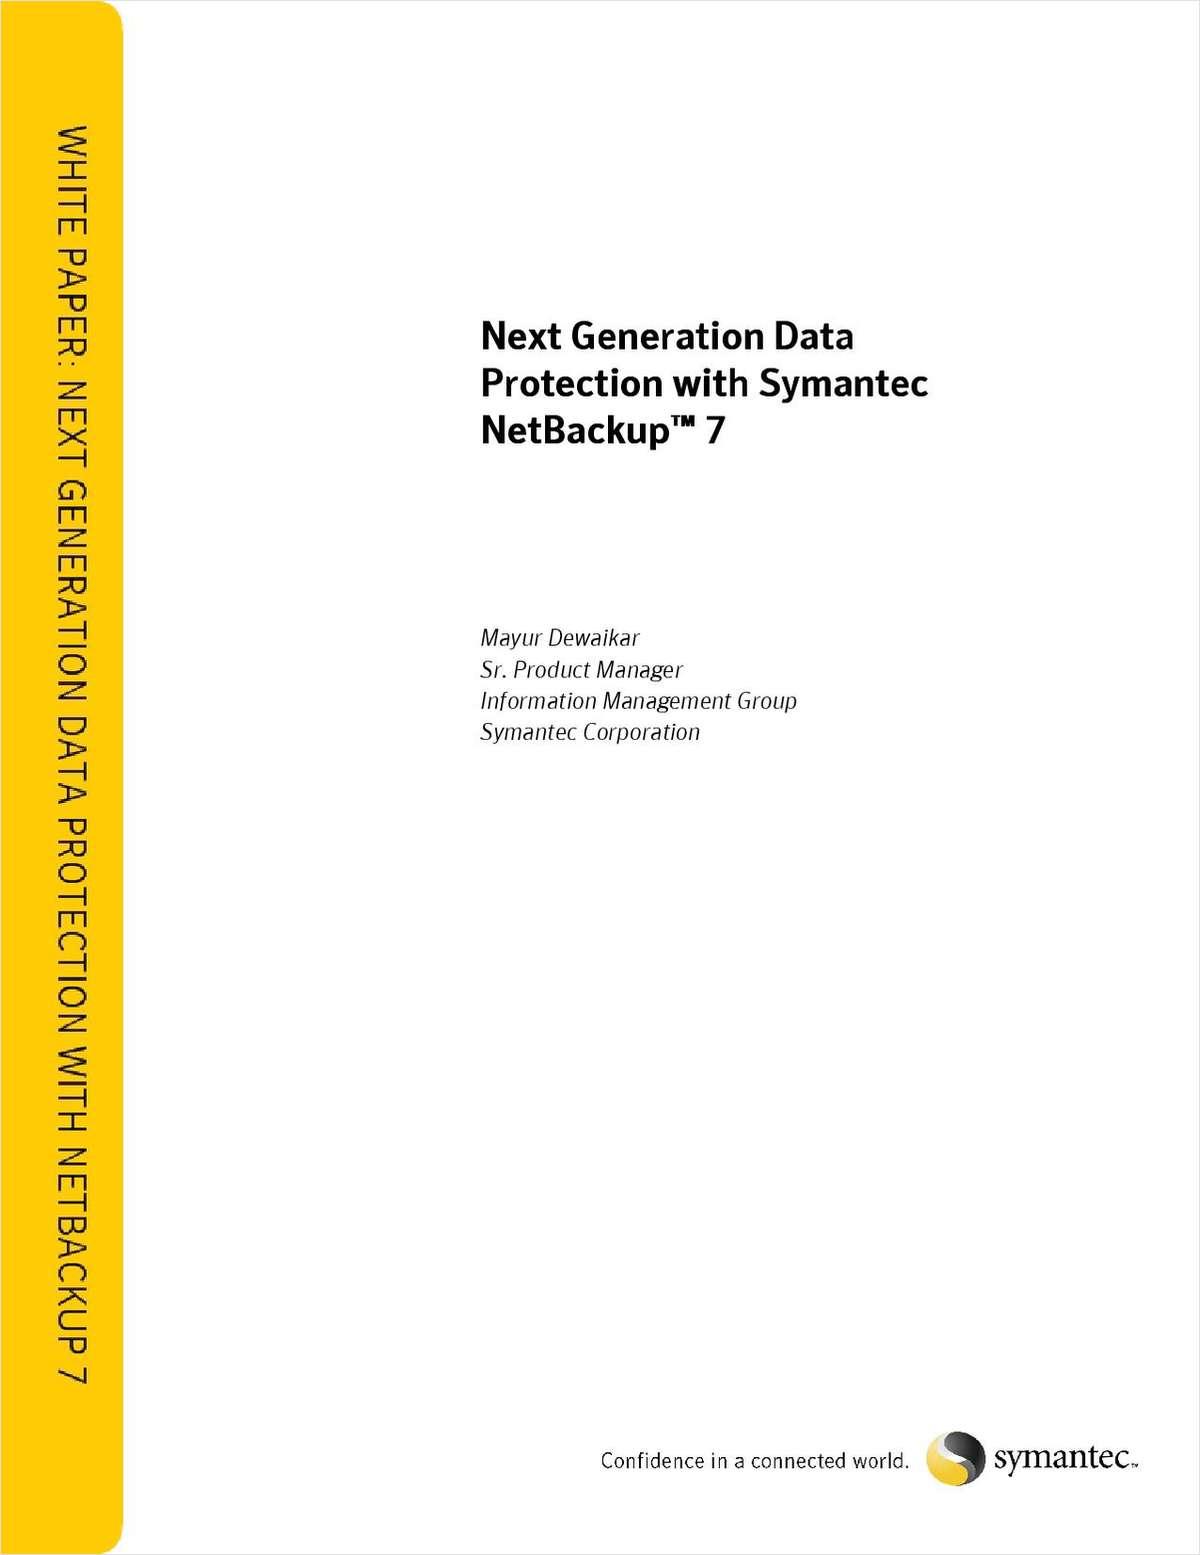 Next Generation Data Protection with Symantec NetBackup™ 7